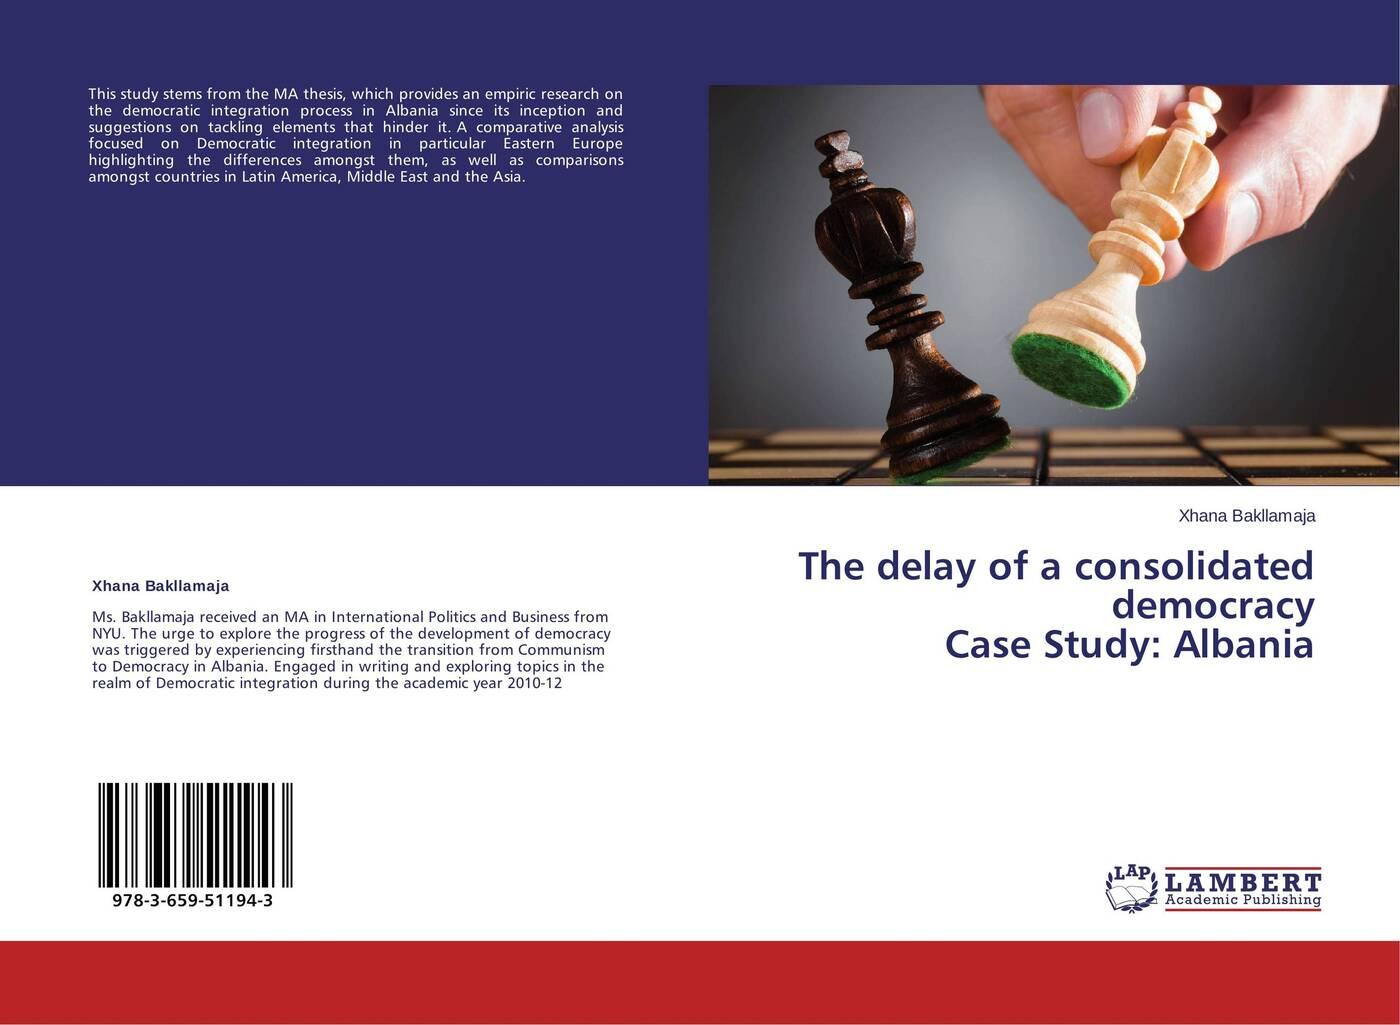 Xhana Bakllamaja The delay of a consolidated democracy Case Study: Albania friendly eastern border the case study of podlaskie voivodship